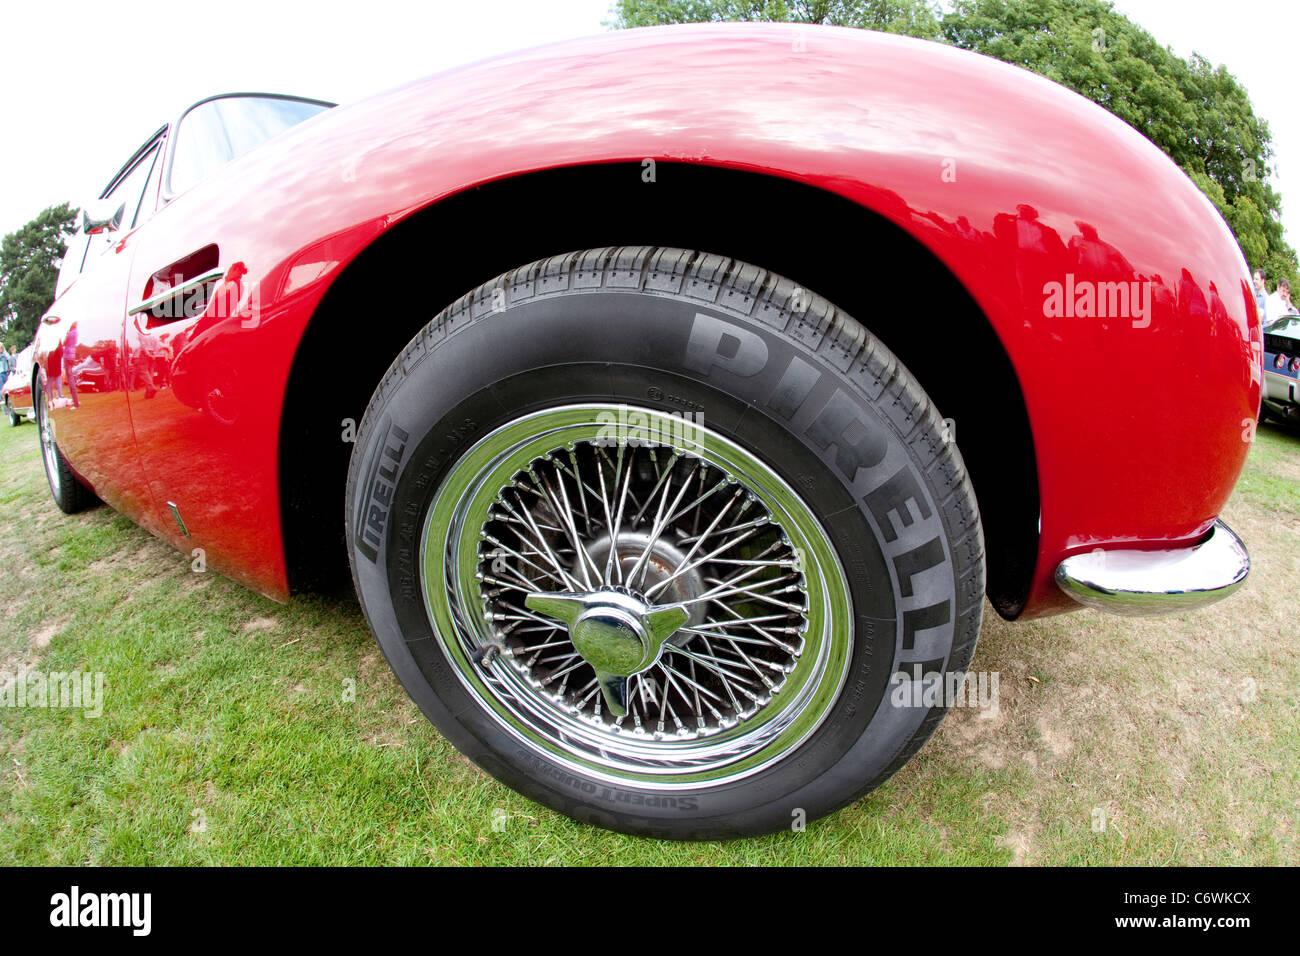 Classics On The Common Harpenden 2011 Red Aston Martin Db6 Pirelli Stock Photo Alamy